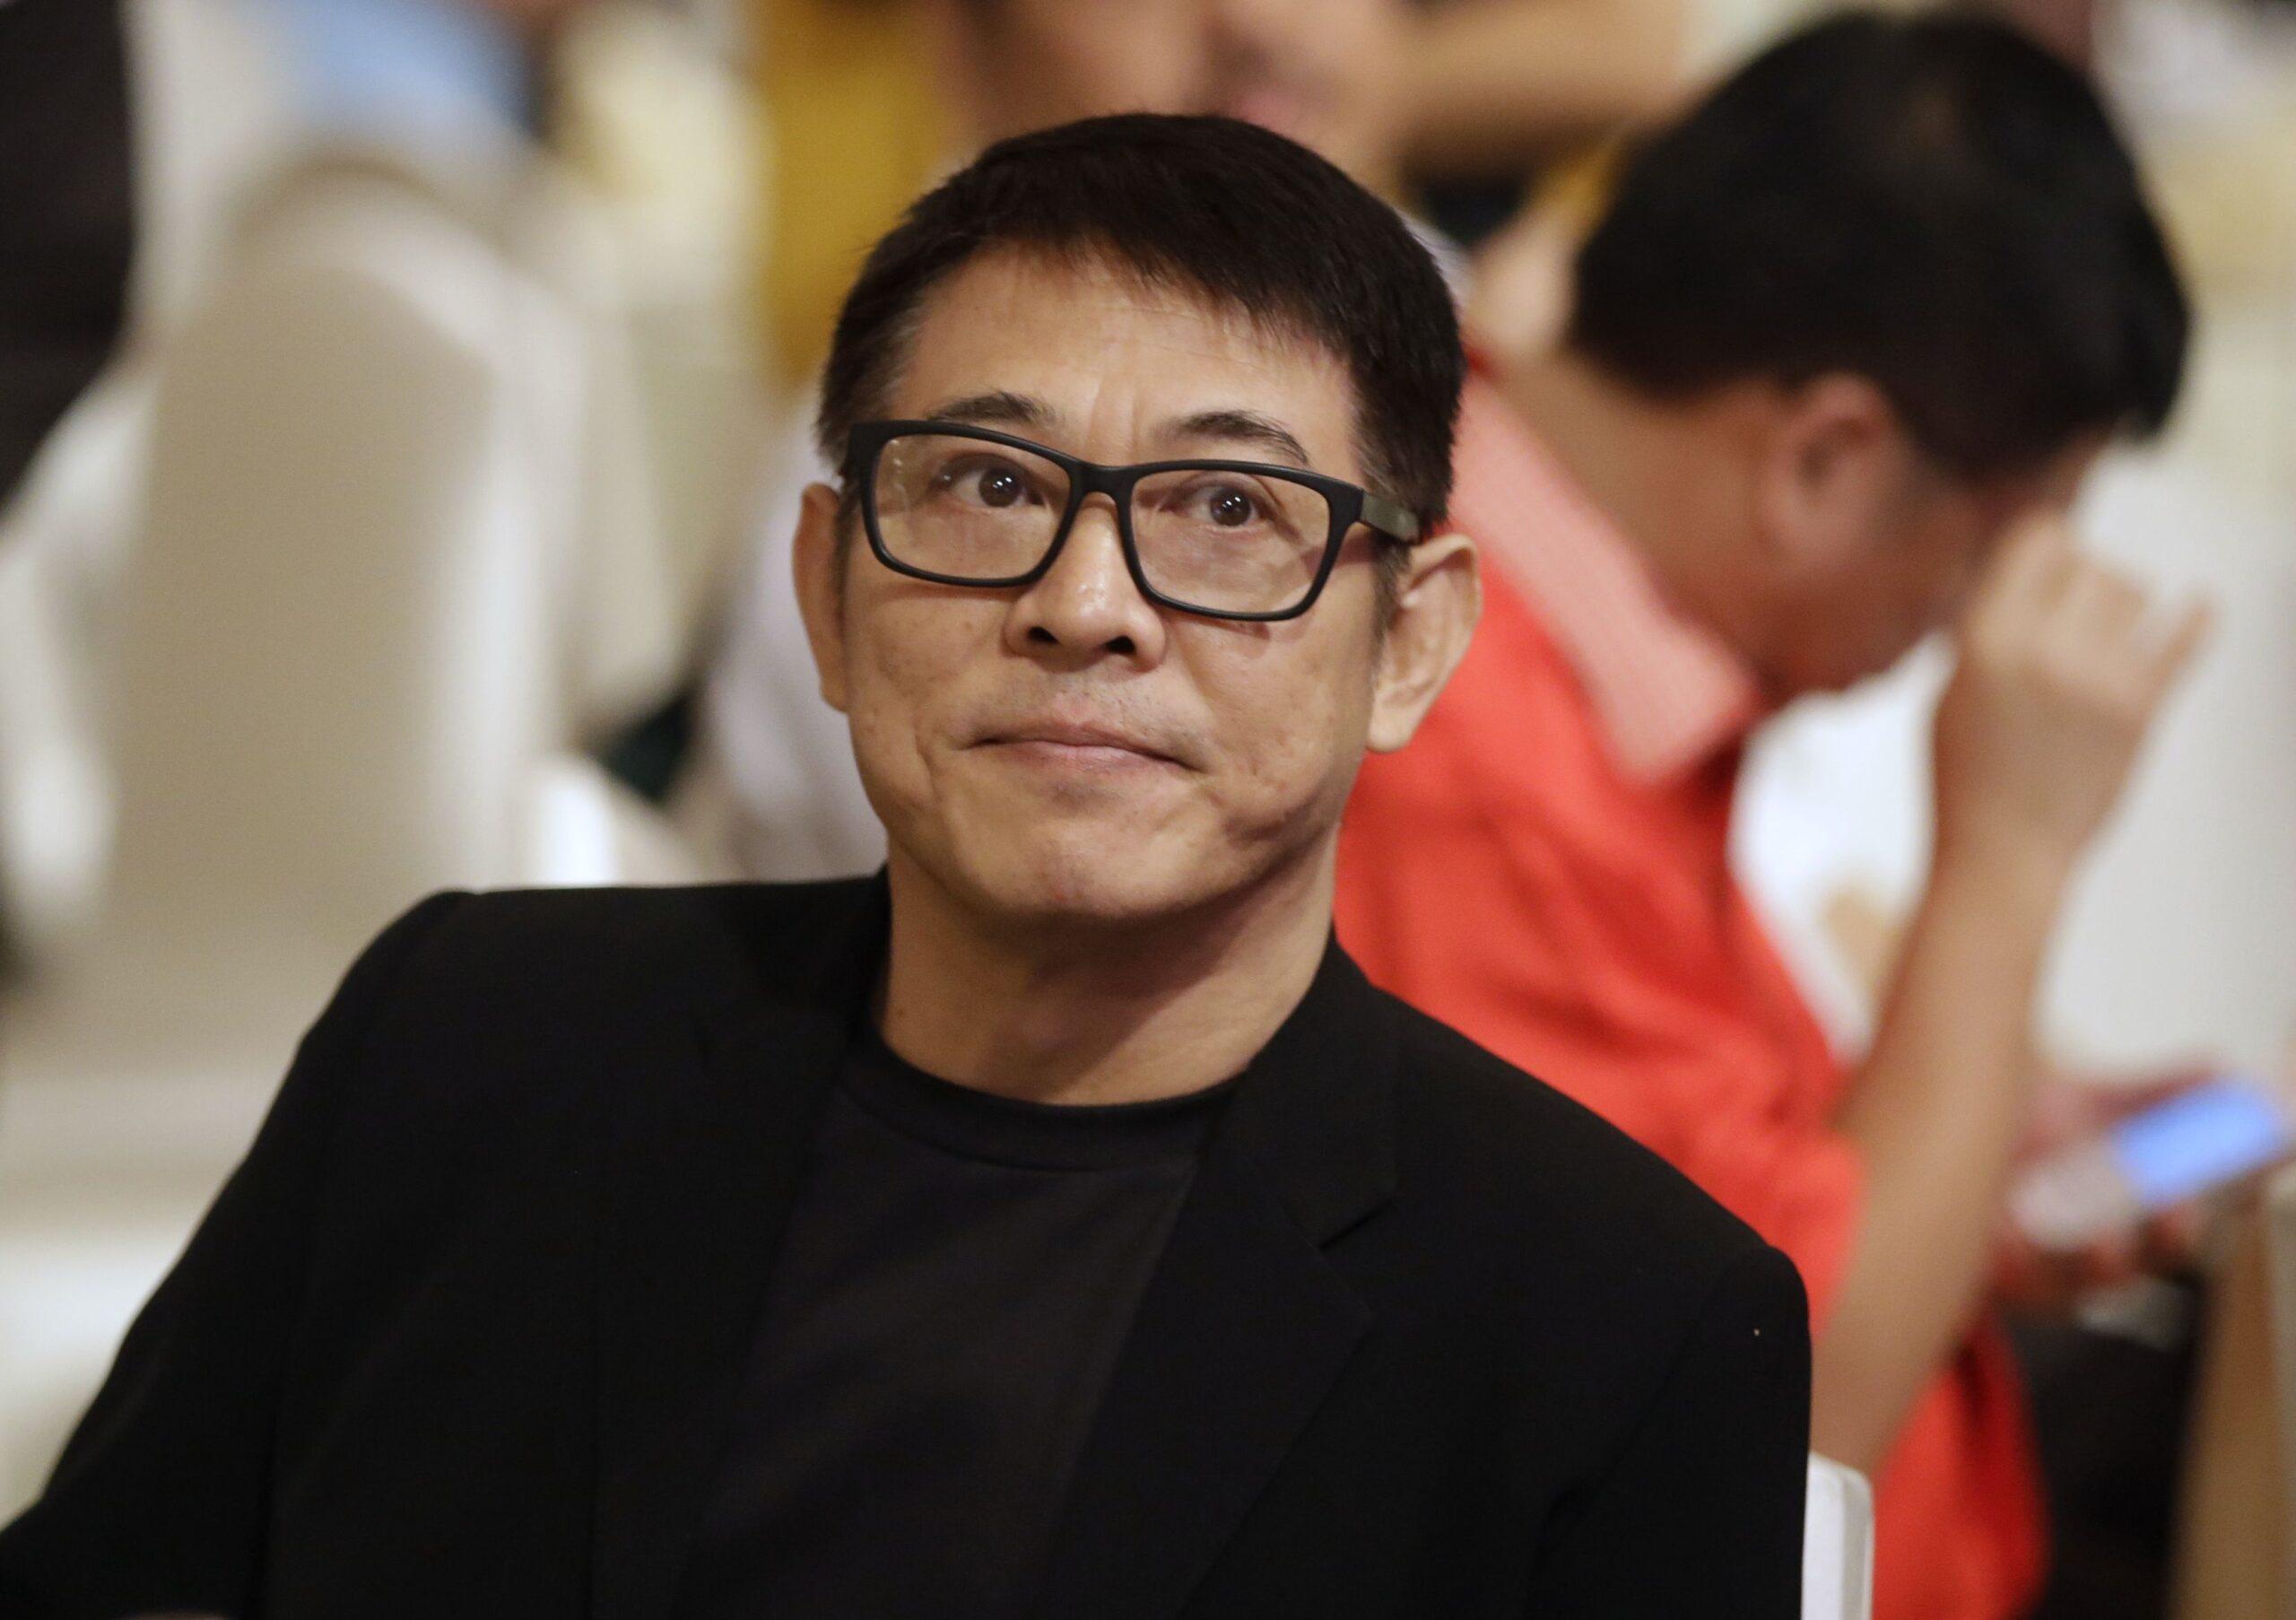 Jet Li Biography, Facts & Life Story Updated 2021